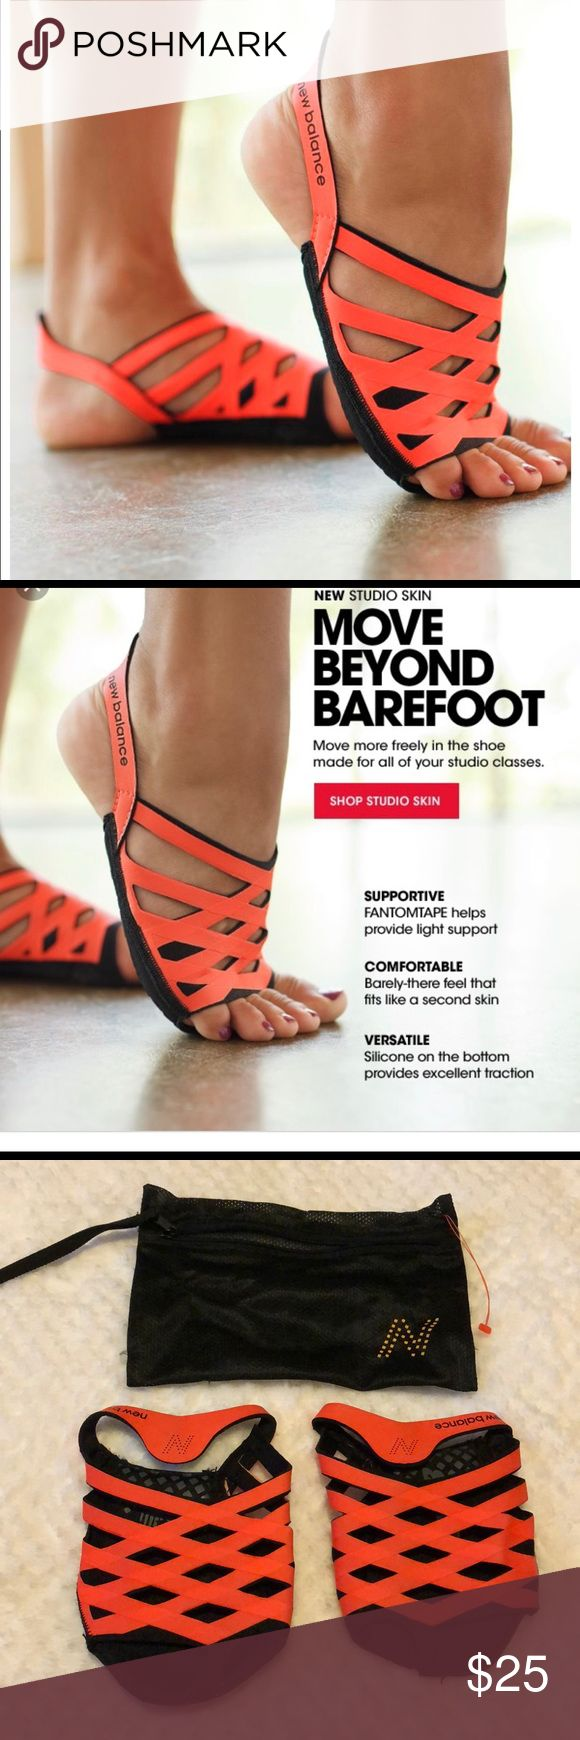 New balance studio skin NWOT new balance studio skin footies. SIZE M. Price is firm. Comes with keepsake bag. New Balance Accessories Hosiery & Socks